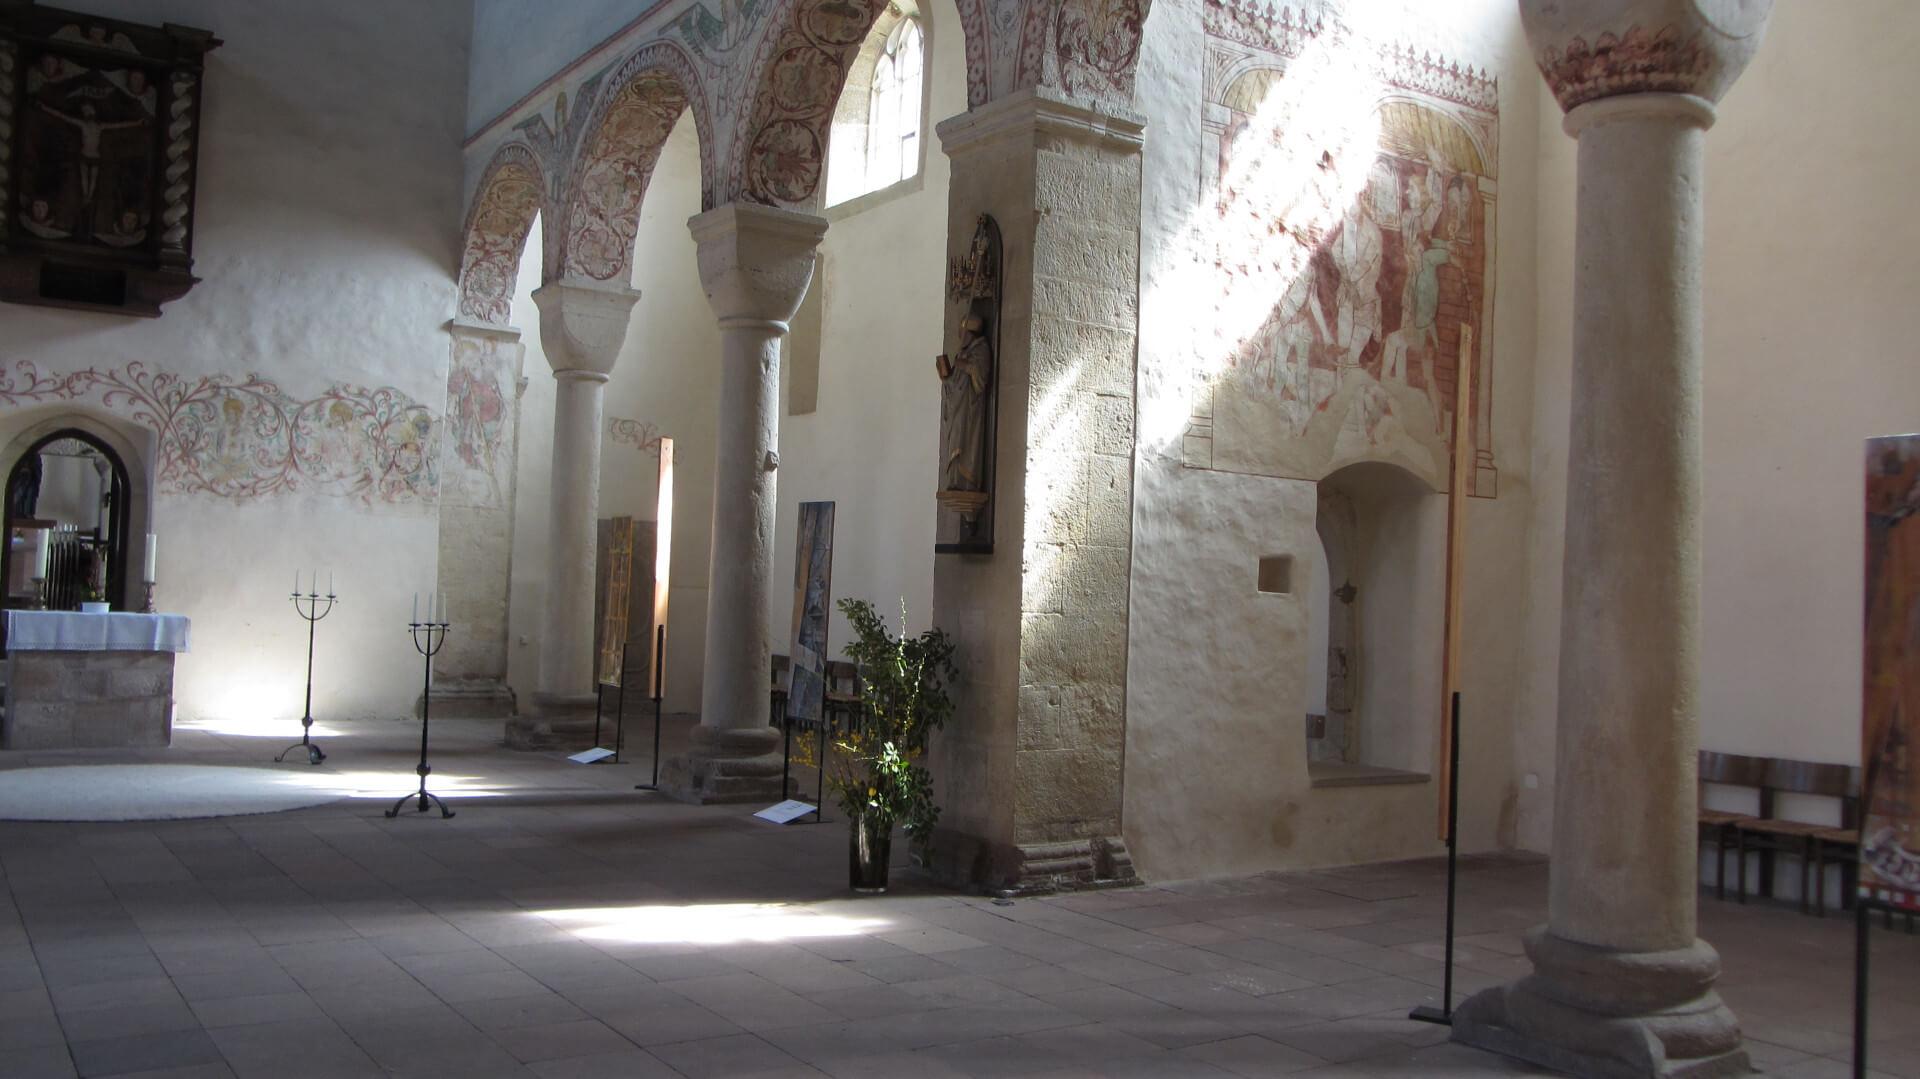 Kloster Bursfelde, Innenansicht